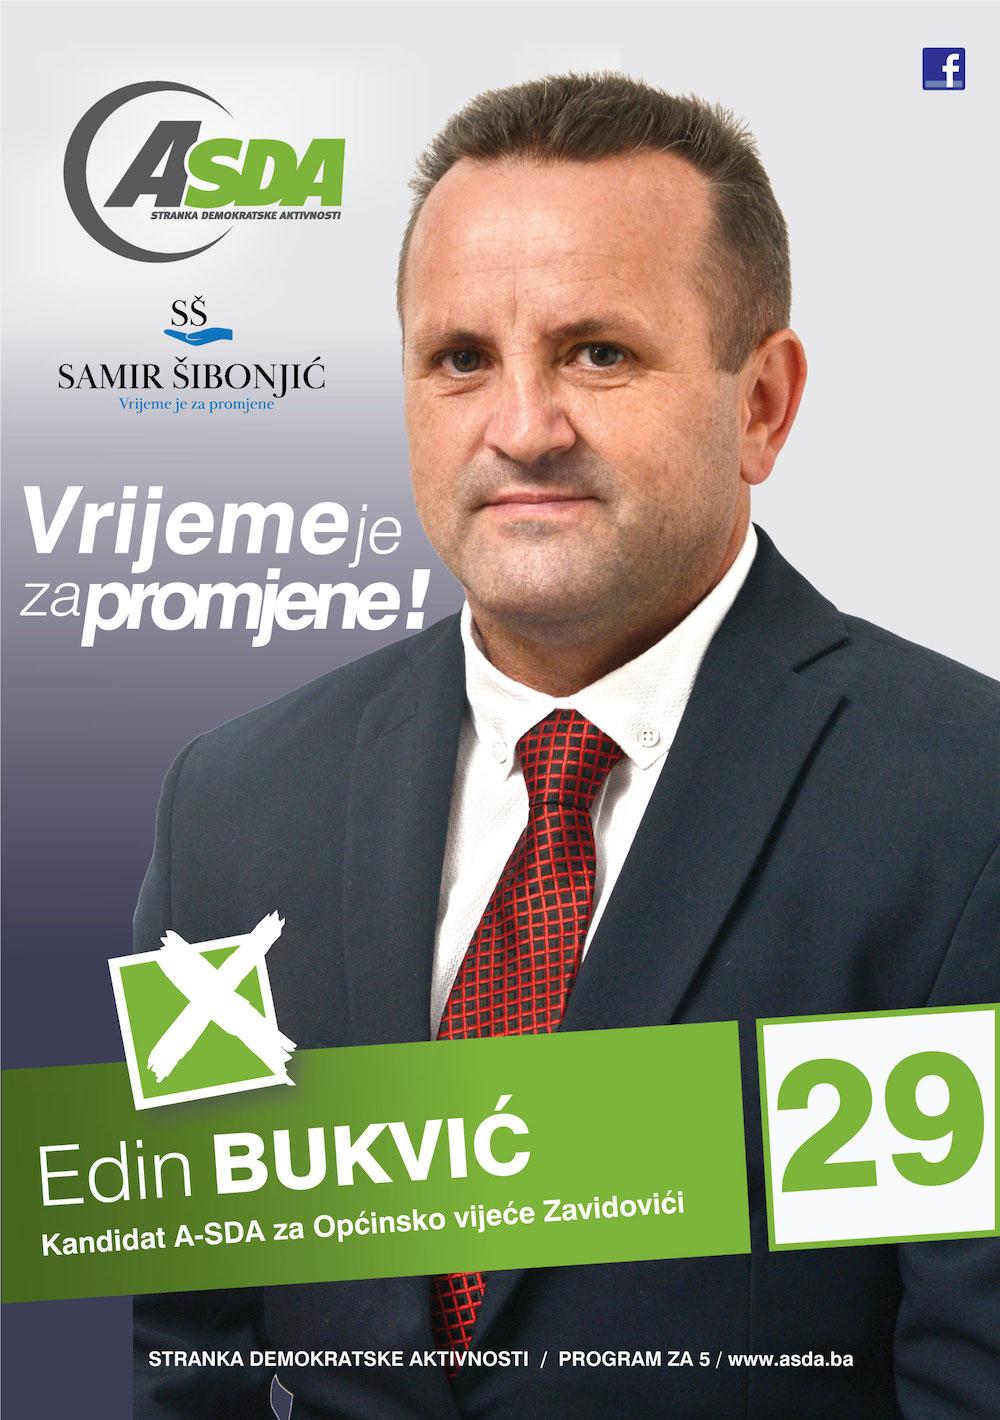 Edin Bukvić